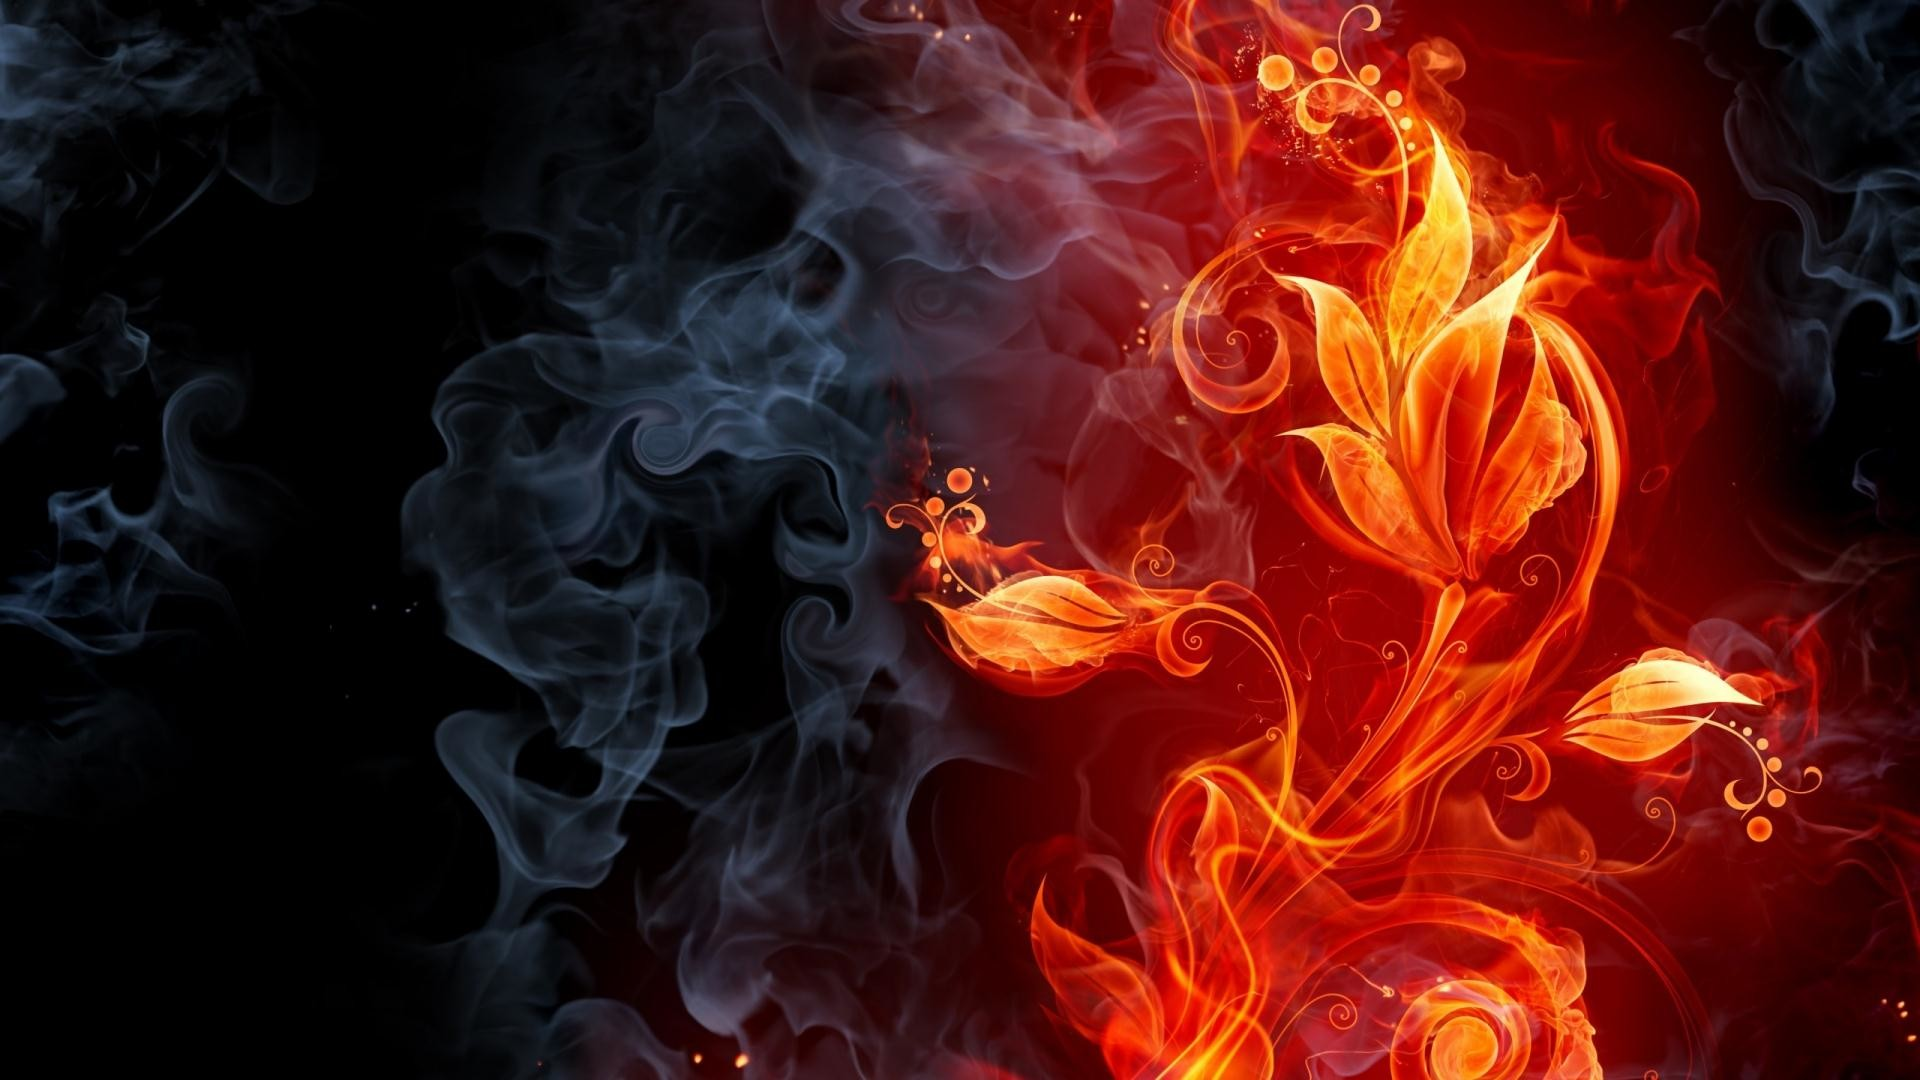 Fire Wallpaper Creative Fire Wallpapers WPRT LanLinGLaureL